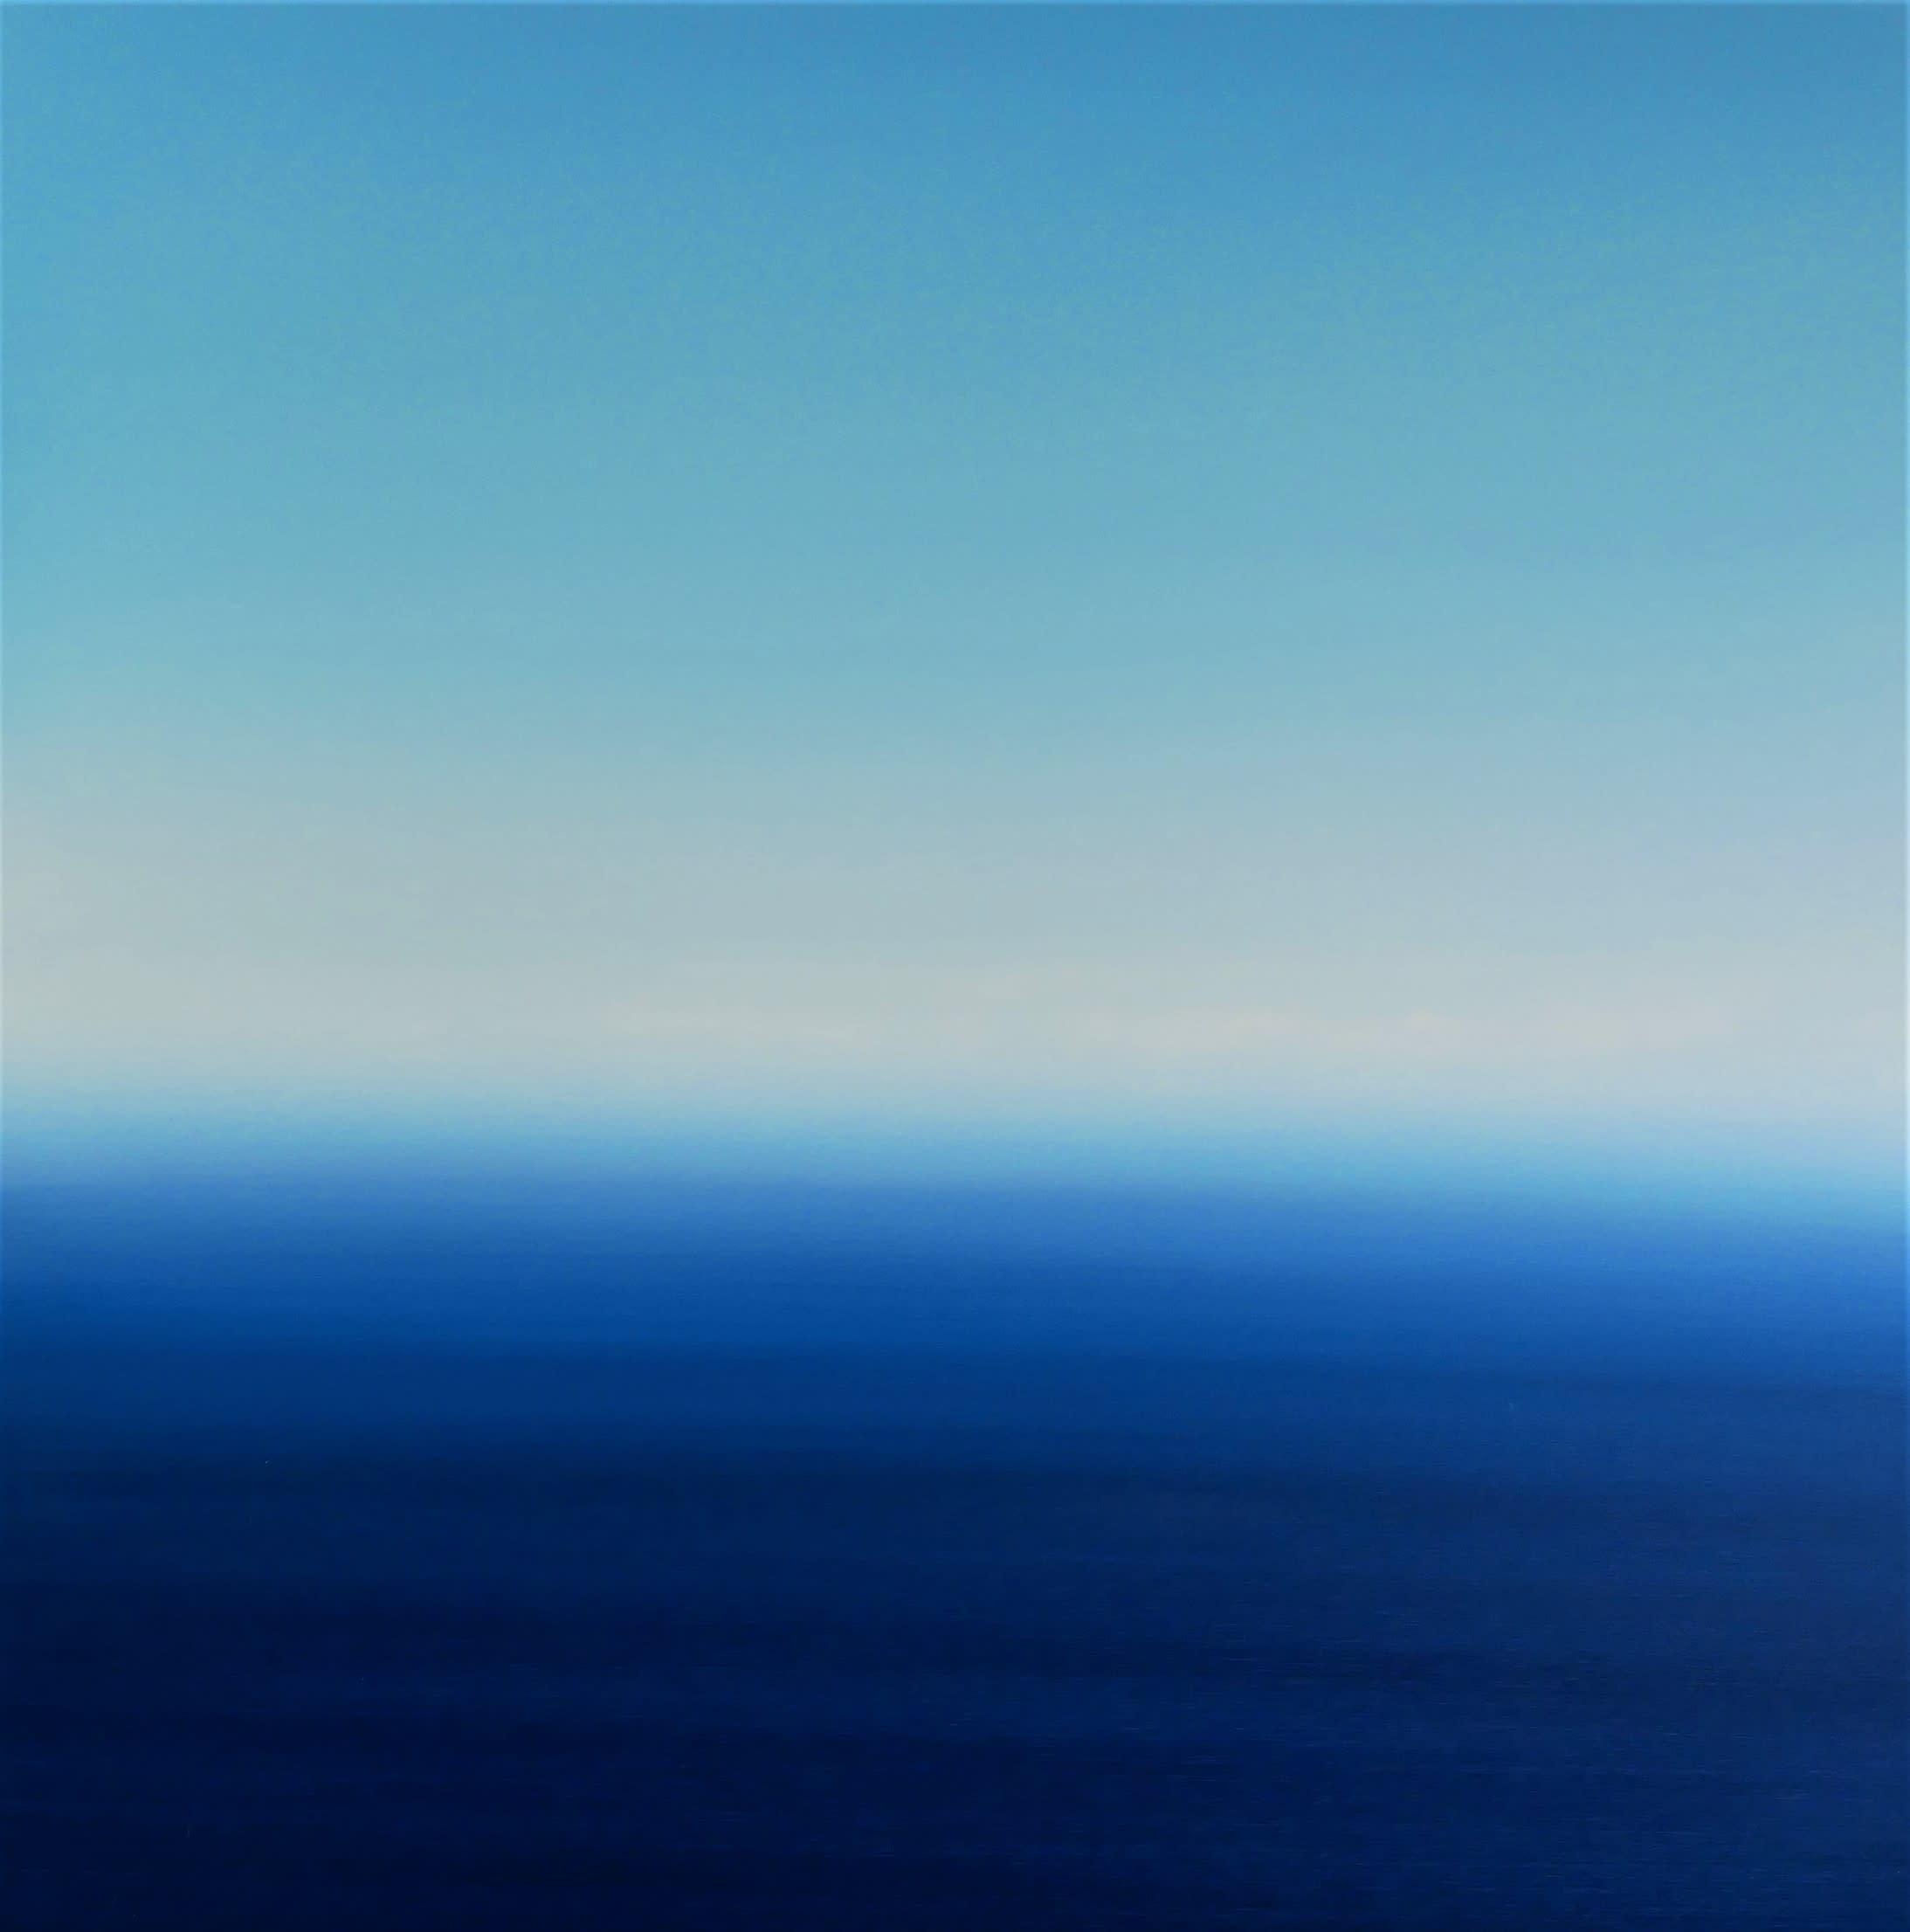 "<span class=""link fancybox-details-link""><a href=""/artists/78-martyn-perryman/works/7397-martyn-perryman-atlantic-light-st-ives-bay-2020/"">View Detail Page</a></span><div class=""artist""><strong>Martyn Perryman</strong></div> b. 1963 <div class=""title""><em>Atlantic Light St Ives Bay </em>, 2020</div> <div class=""medium"">oil on canvas</div> <div class=""dimensions"">h. 100 x w. 100 cm </div><div class=""price"">£1,400.00</div><div class=""copyright_line"">Ownart: £140 x 10 Months, 0% APR</div>"